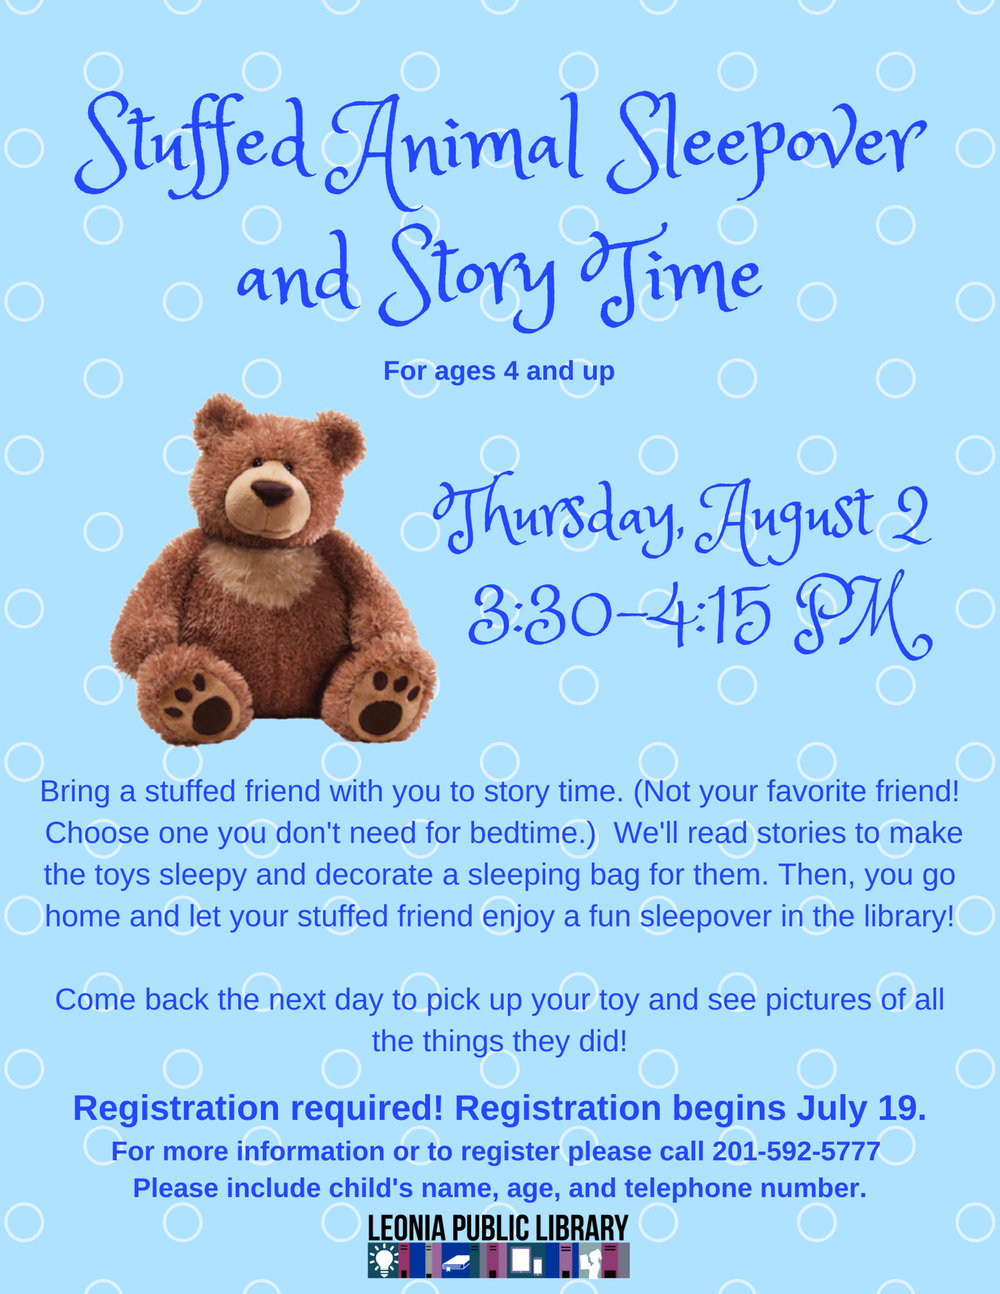 Stuffed Animal Sleepover and Story Time.jpg